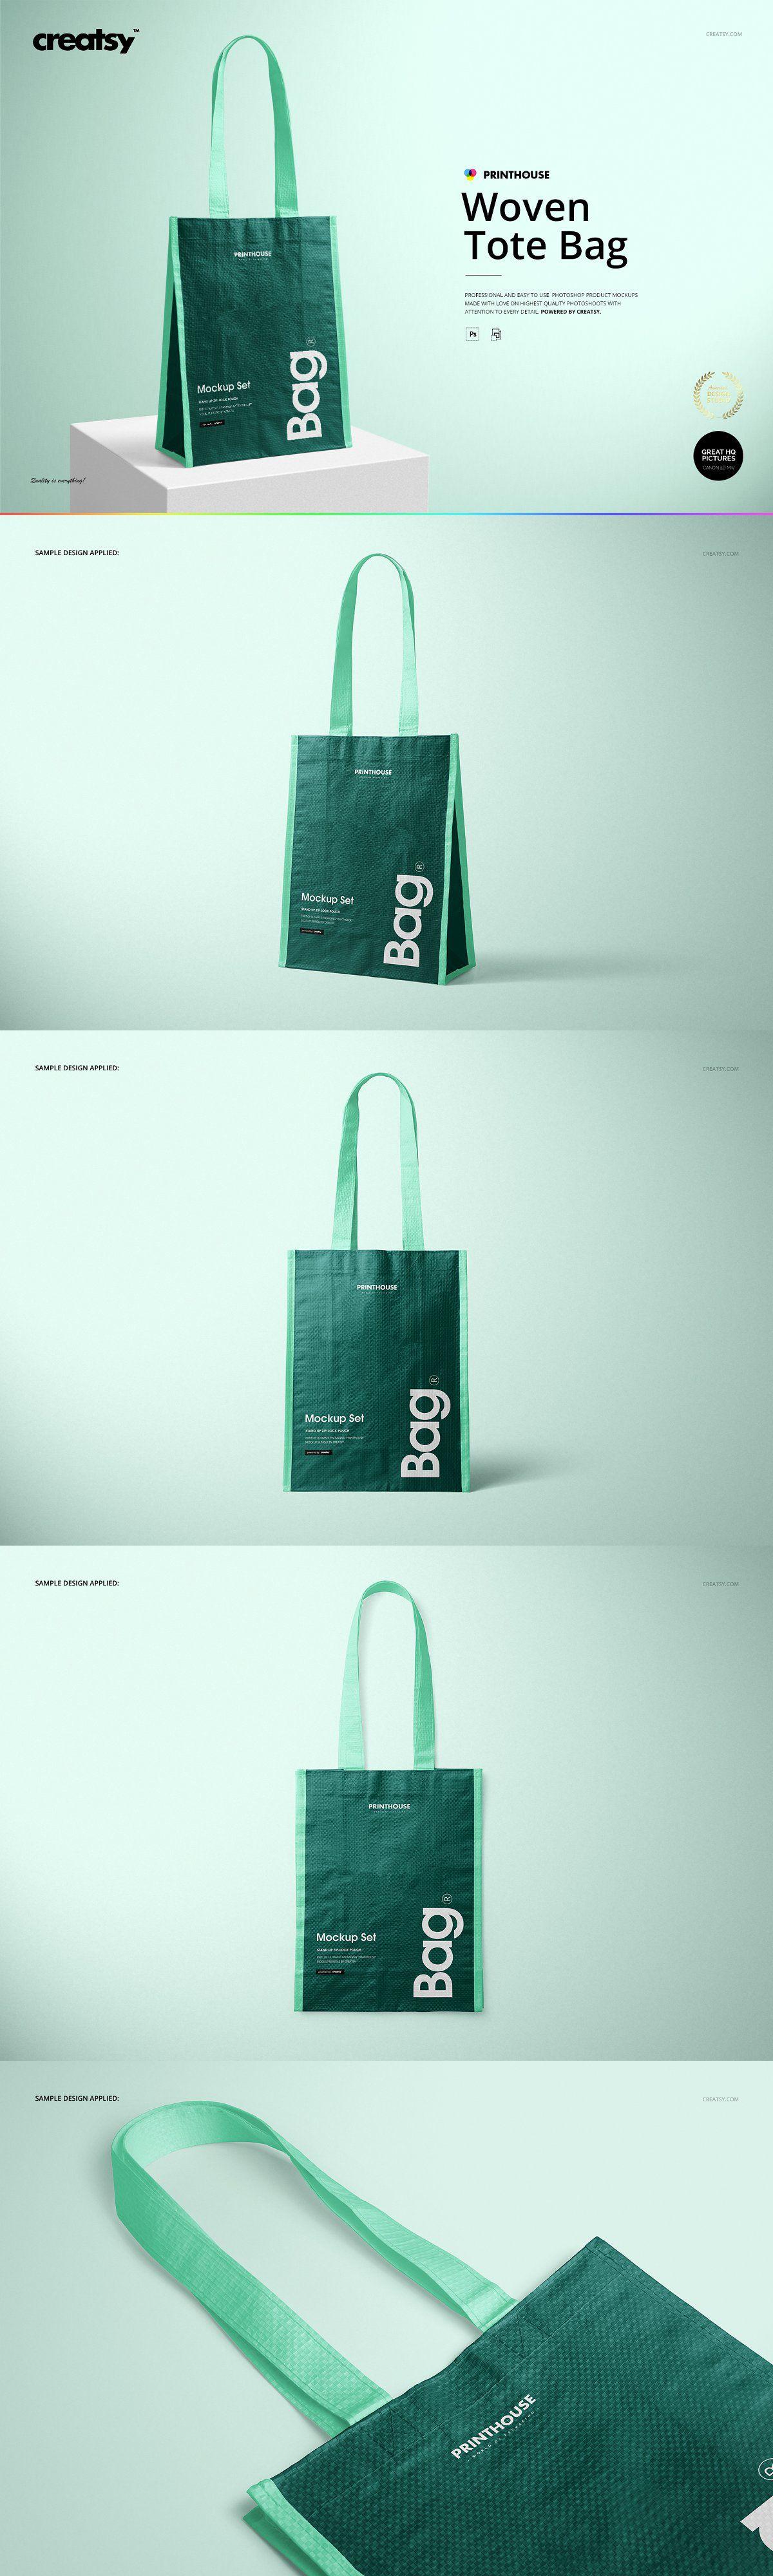 Download Woven Tote Bag Mockup Templates Mockup Psd Phone Mockups Mockup Design Beg Design Packaging Testimonials Design Woven Tote Bag Logotype Design